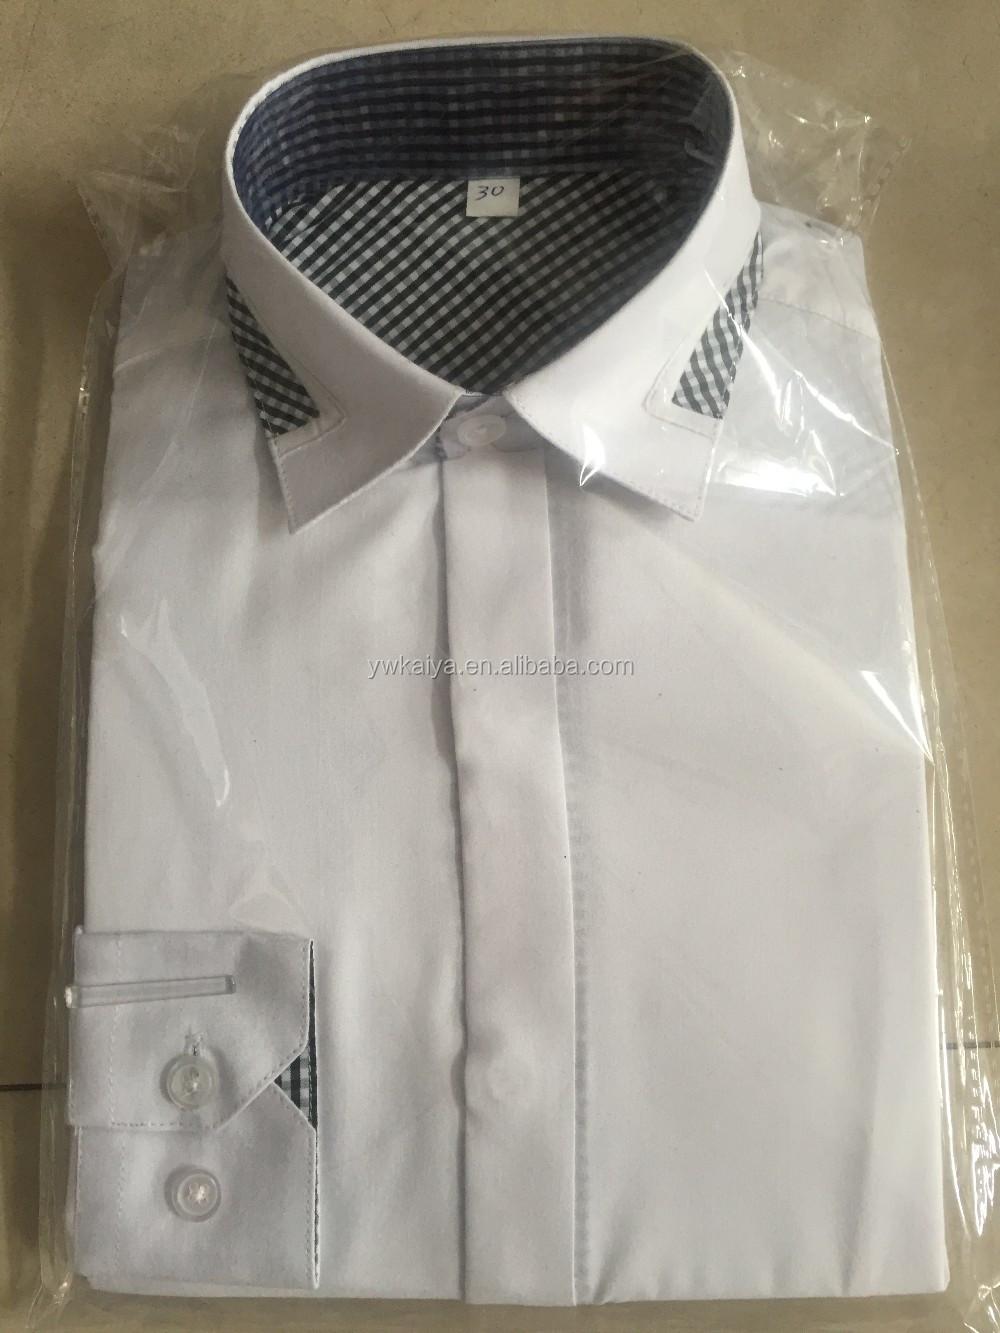 Shirt design boy 2016 - 2016 Boutique Clothing Boy School Shirt Fancy Design Invisible Placket Tc Fabric White Color Clothes To